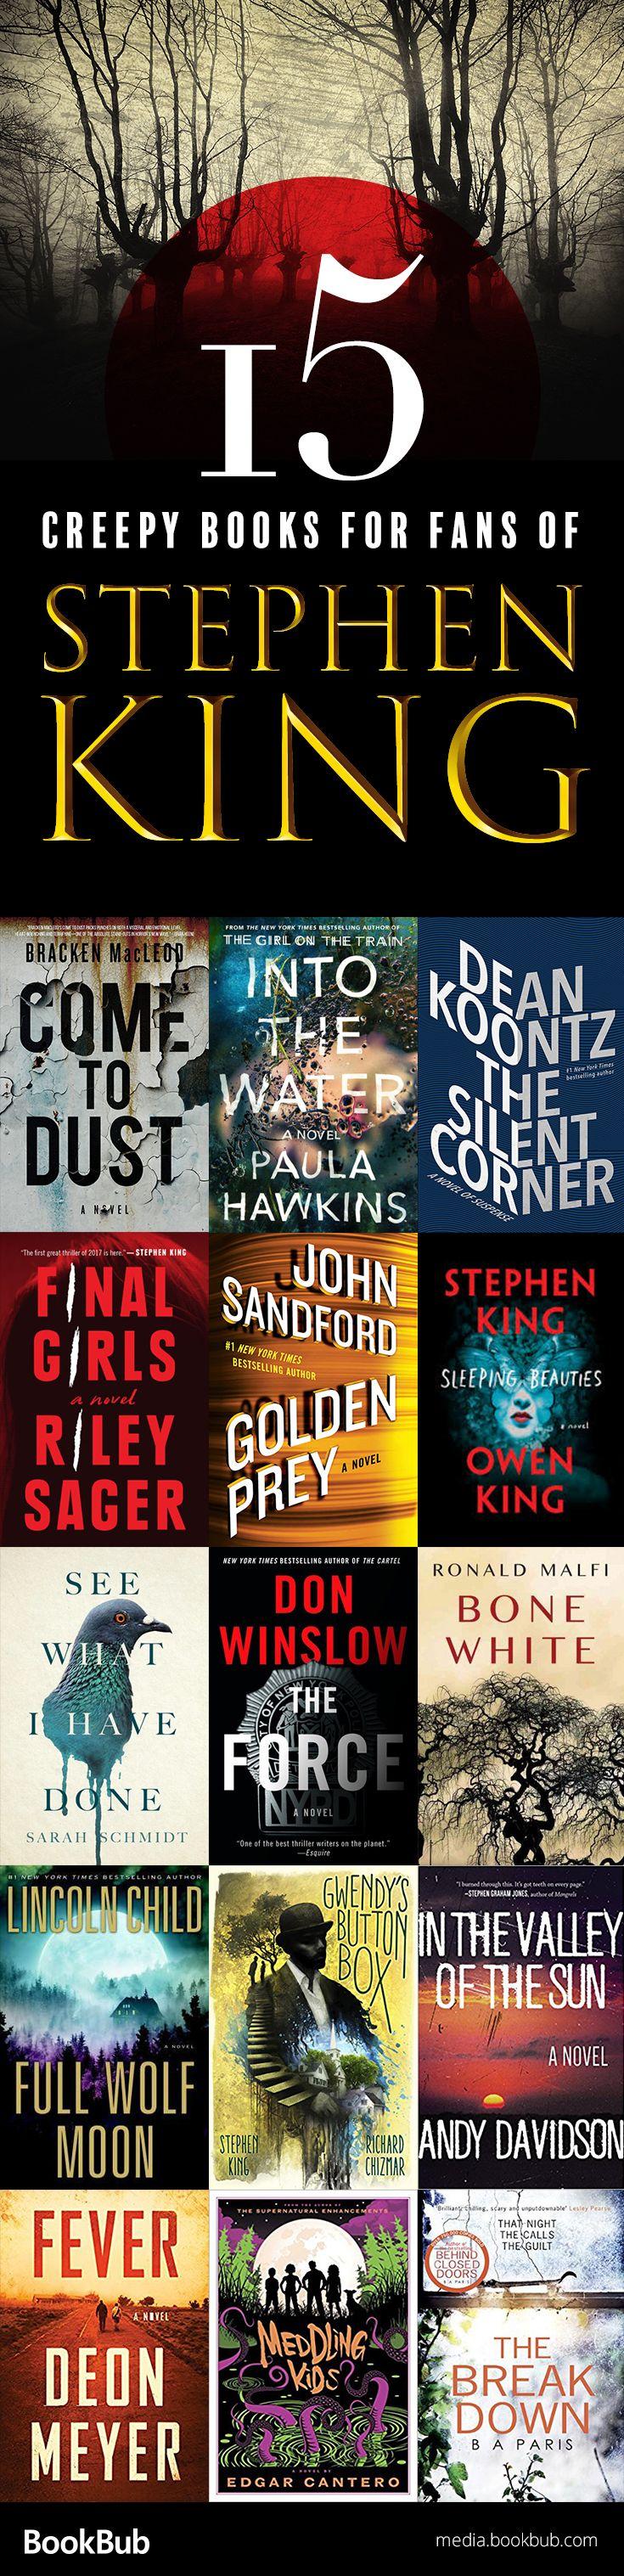 15 Creepy Books For Stephen King Fansing This Summer